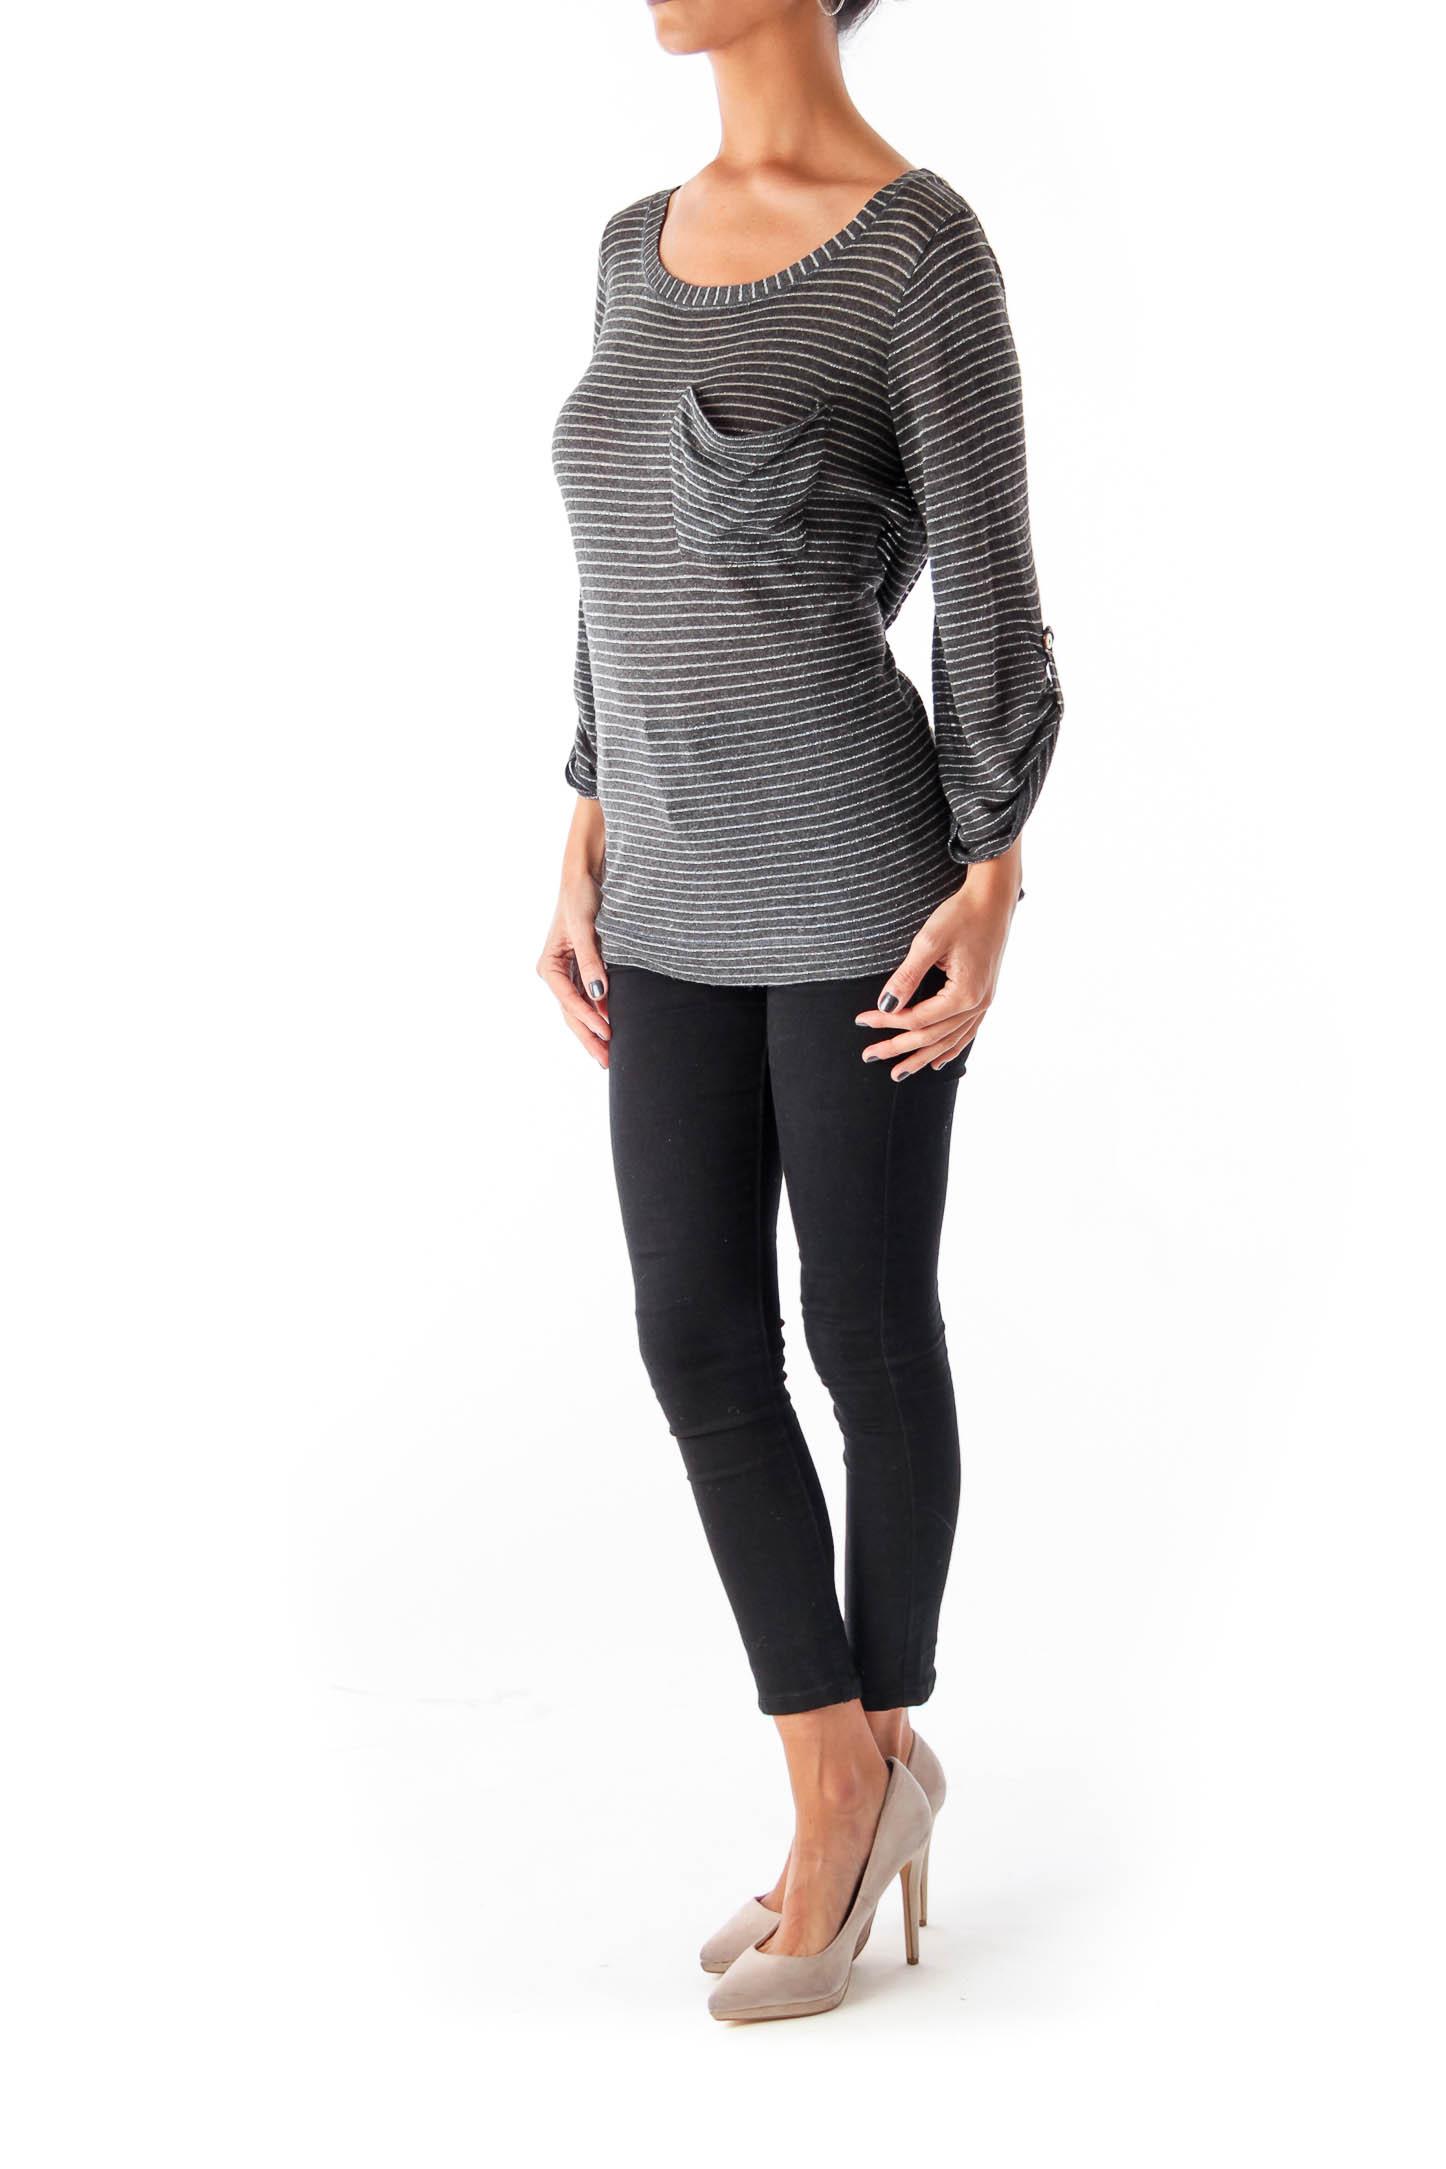 Gray & Metallic Stripe Top